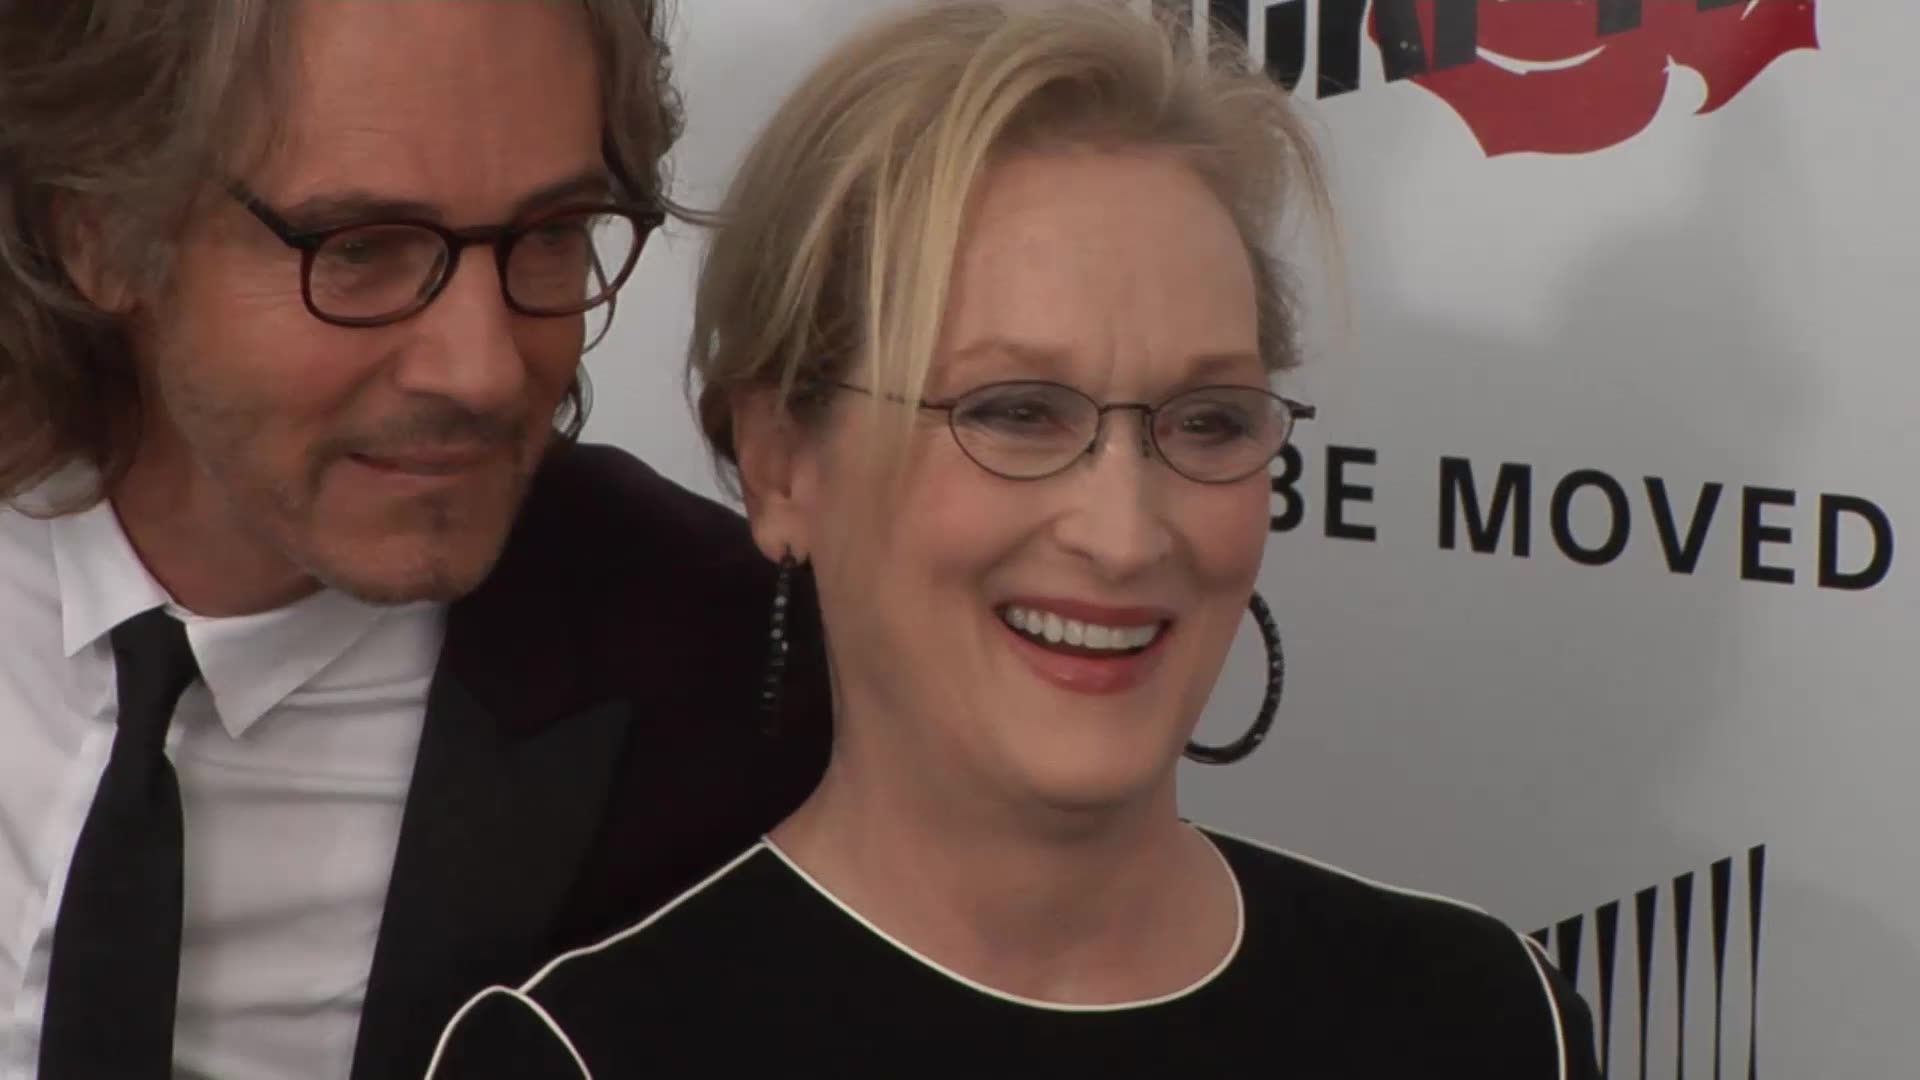 Meryl Streep At The Ricki And The Flash premiere